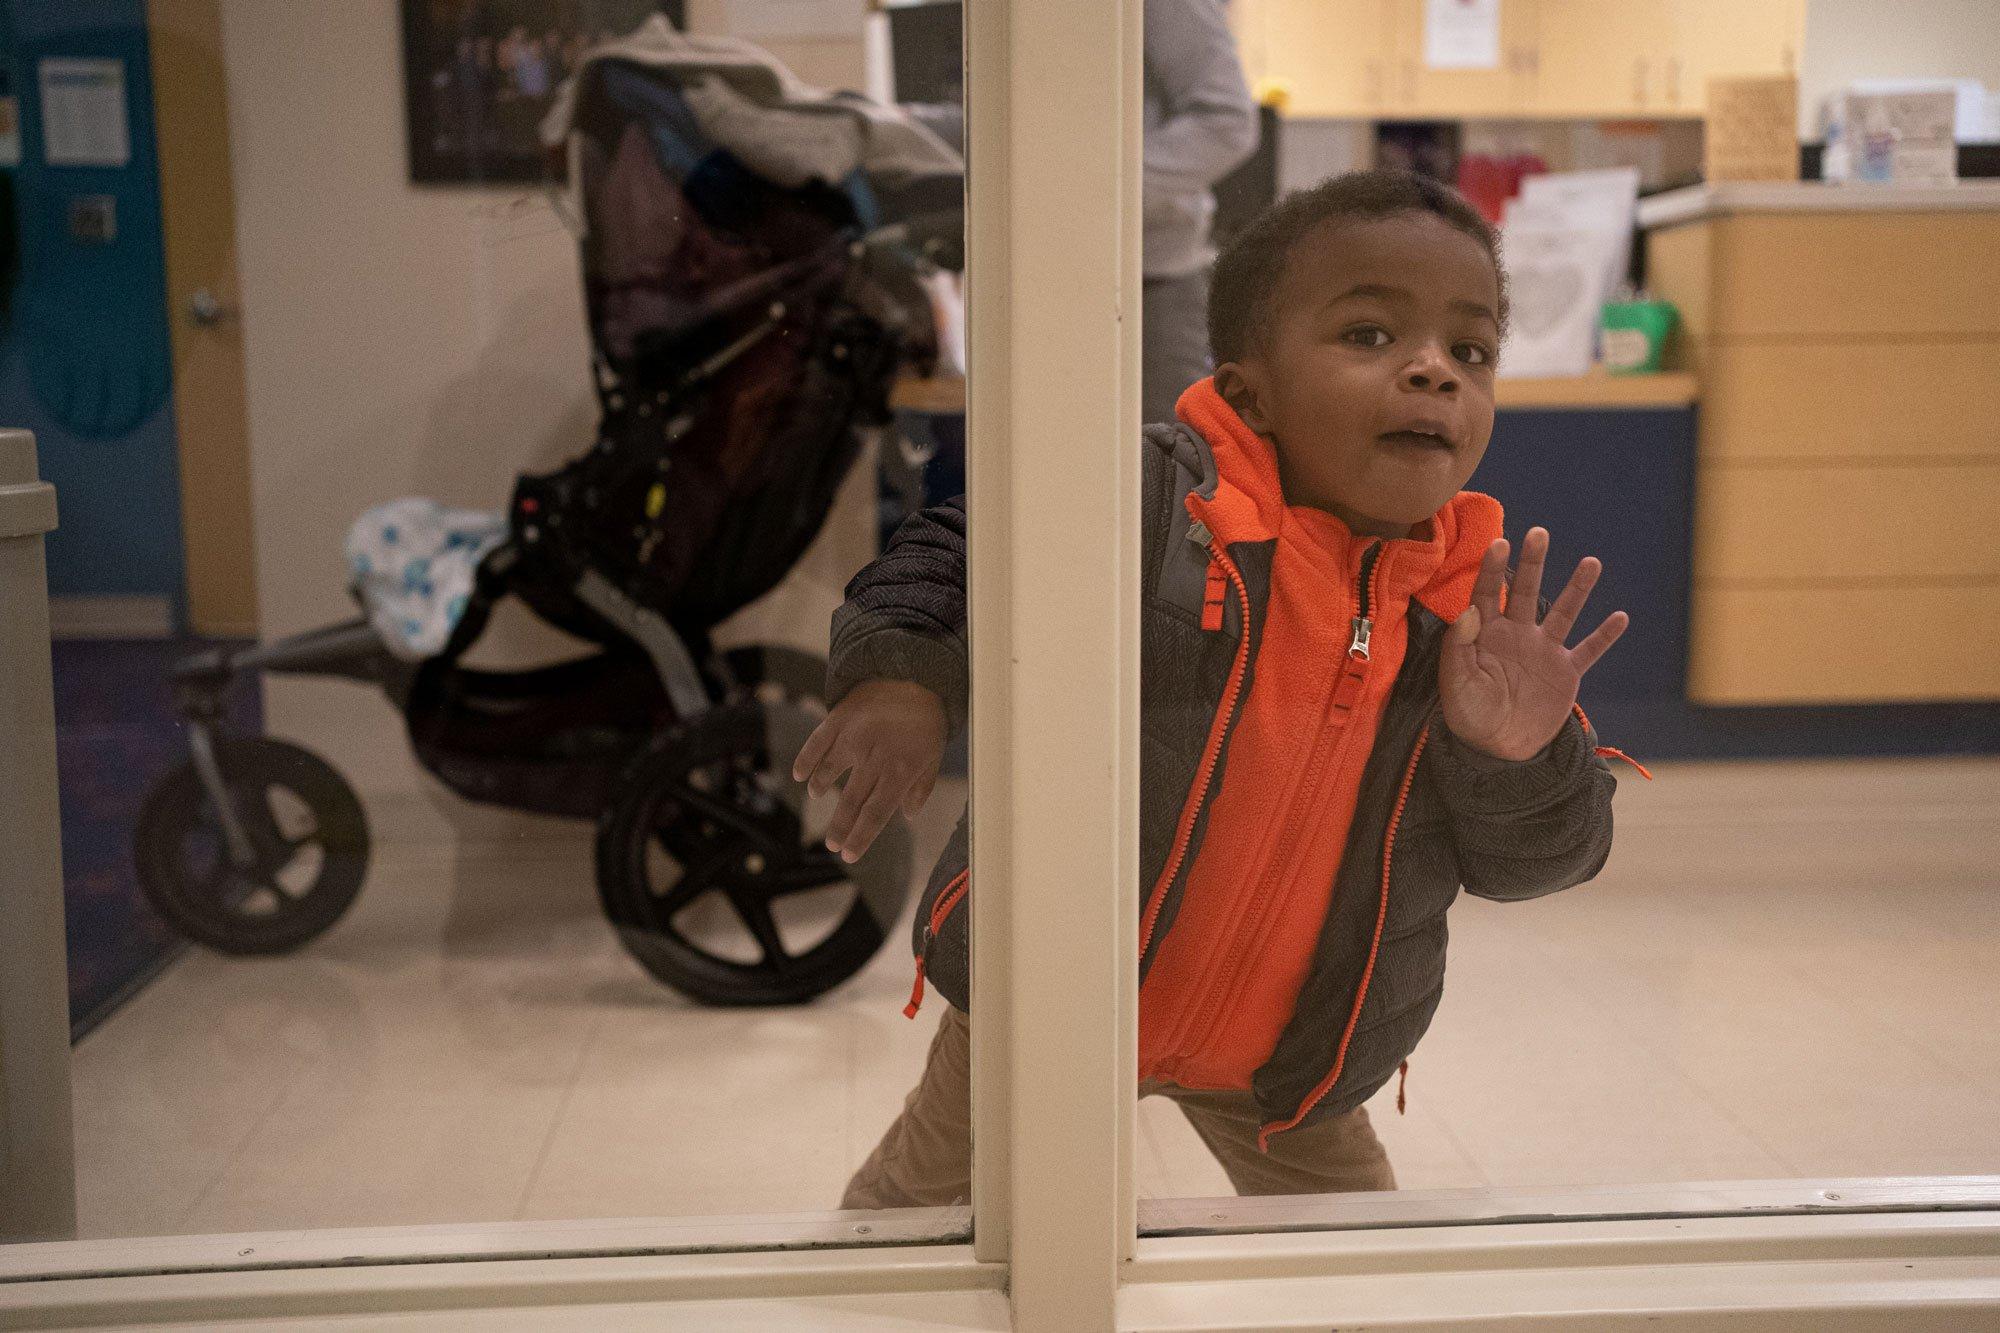 boy peeking out waiting room